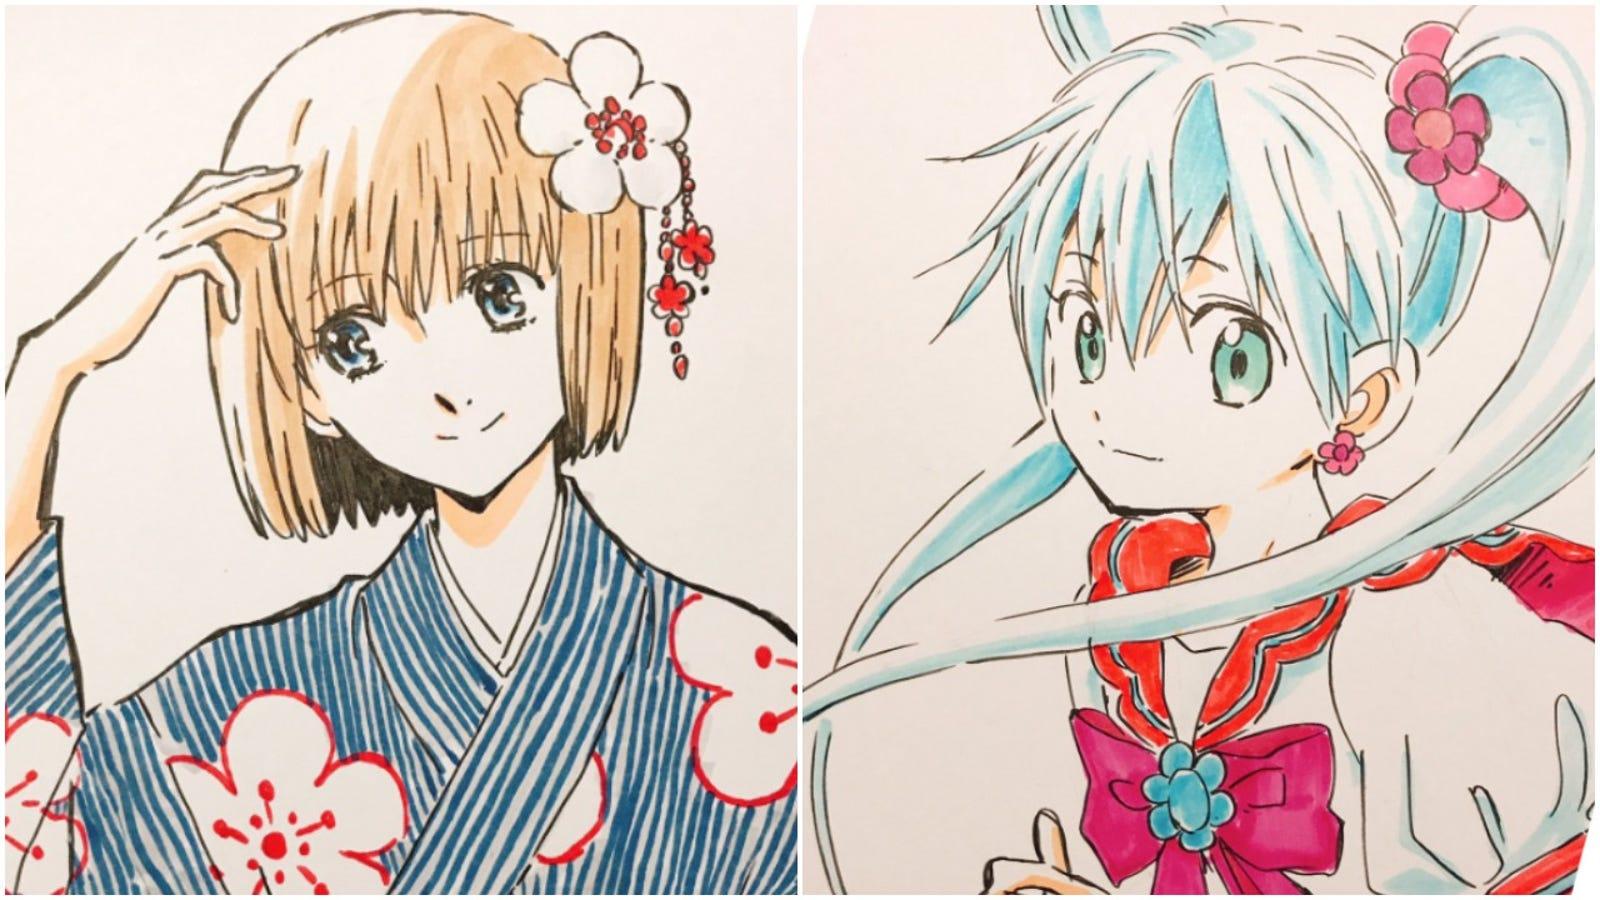 Download 55+ Wallpaper Animasi Anime HD Terbaik